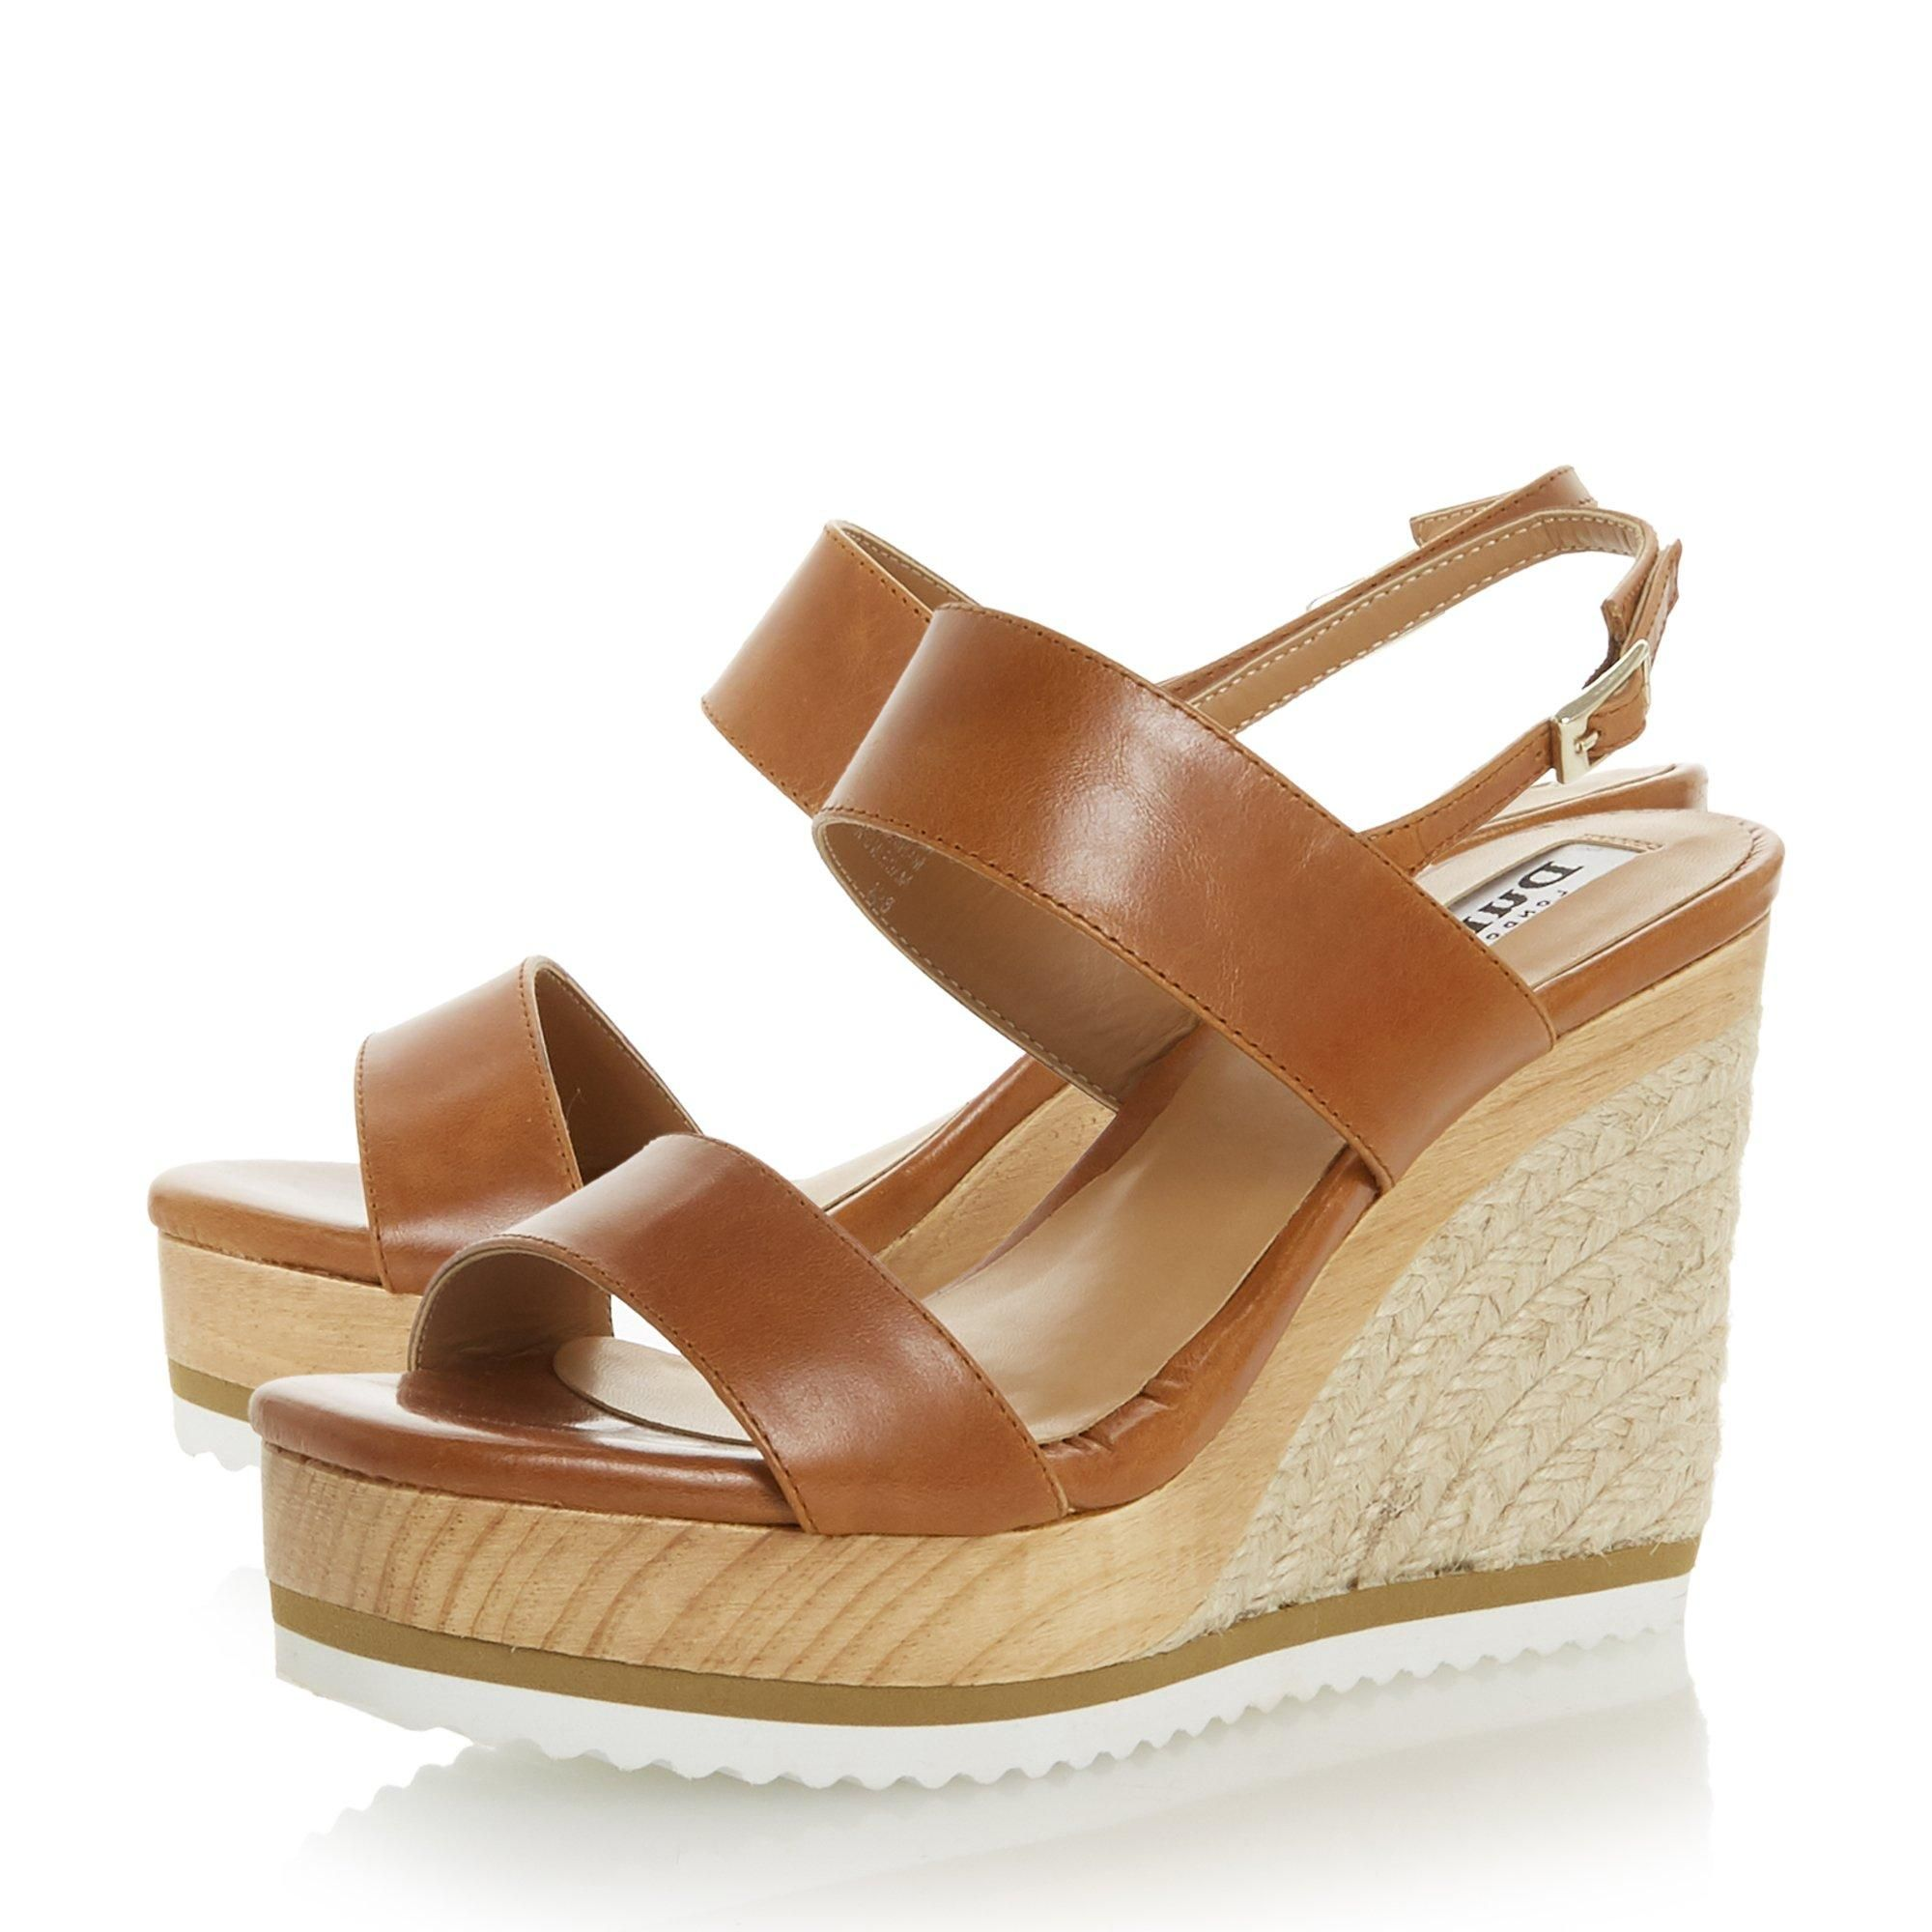 Dune Ladies KARII DB Espadrille Wedge Sandals